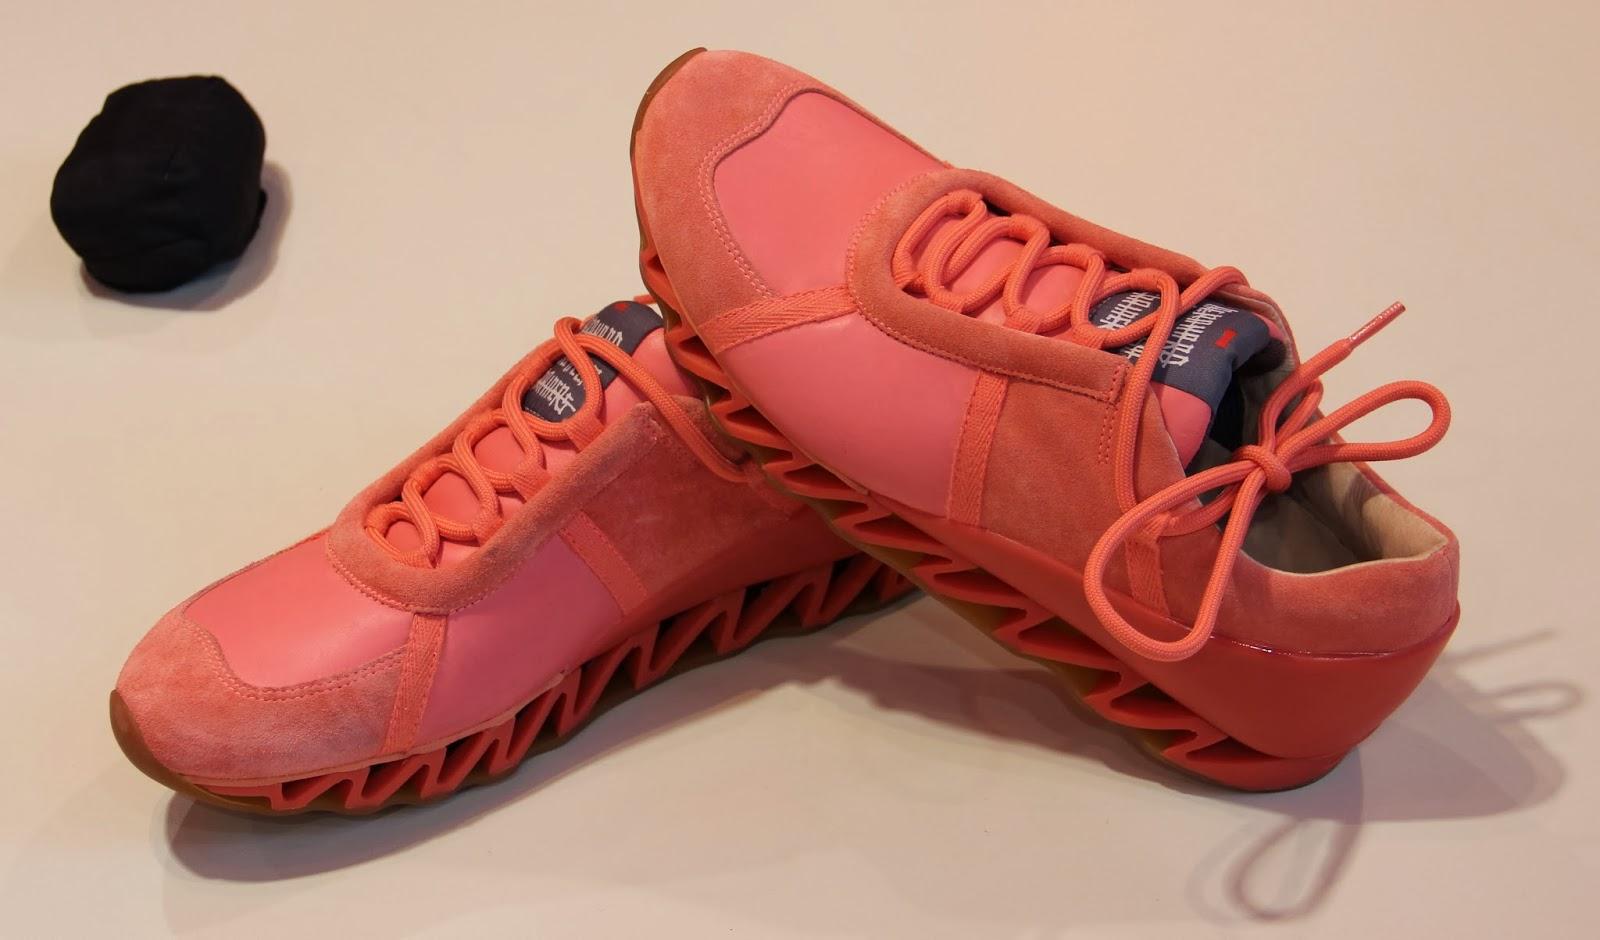 dc2086f42fb1 CAMPER FOOTWEAR TOGETHER Projects S S 2014-Rachel Comey + Bernhard Willhelm